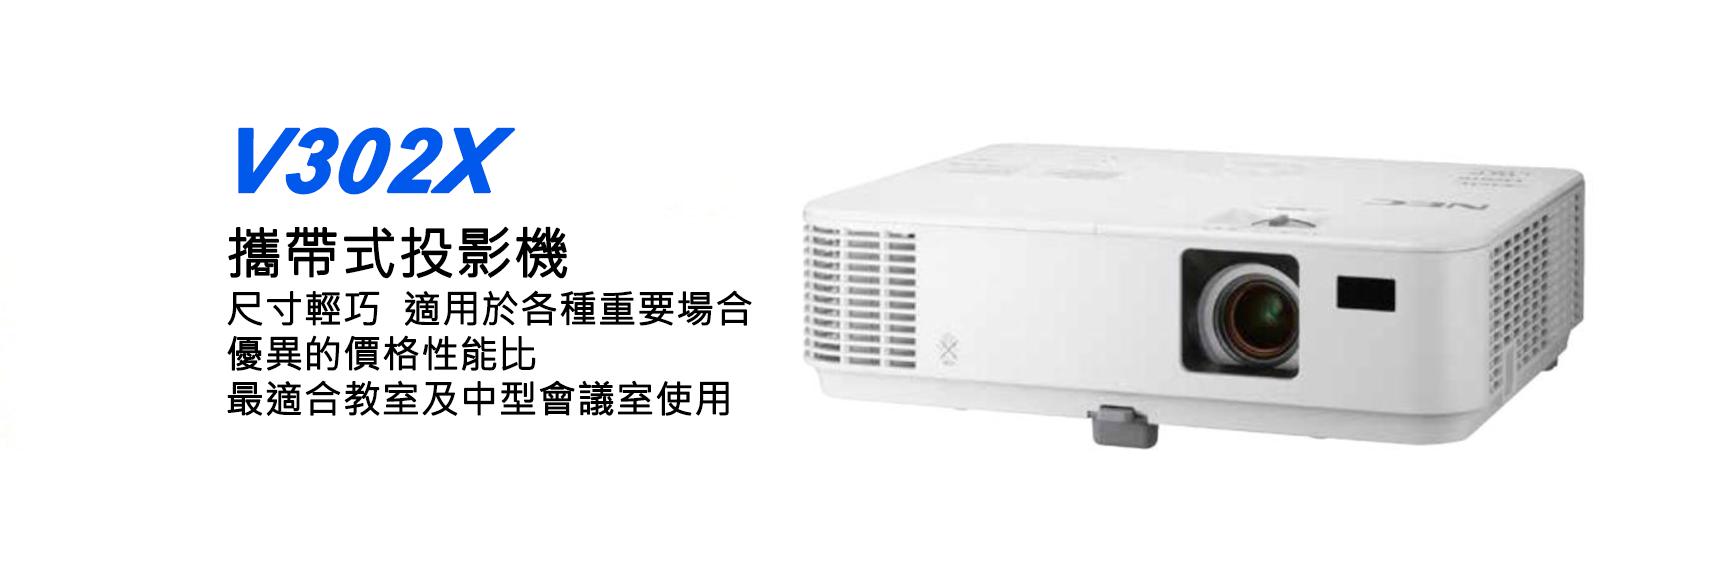 AviewS-NEC V302X投影機/3000流明/XGA/輕便型投影機/DLP